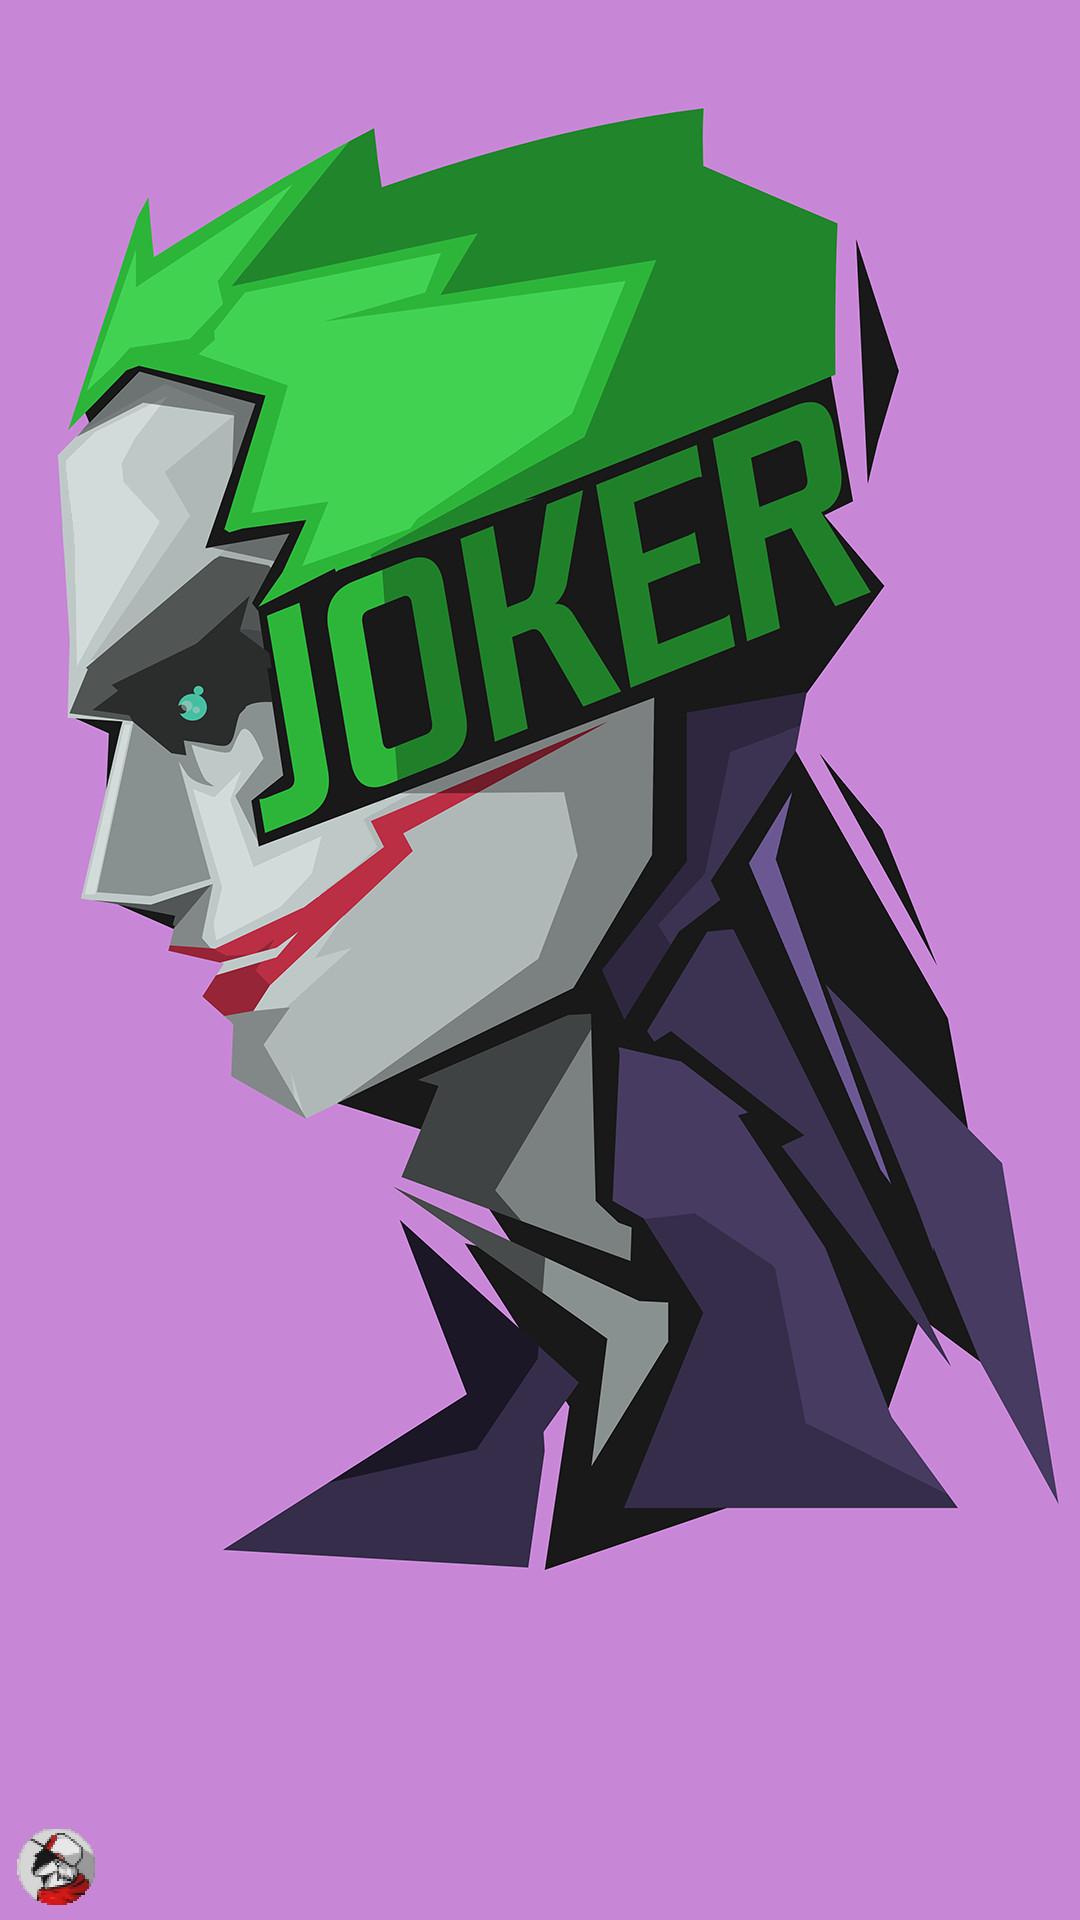 Batman Dark Knight Joker HD Wallpaper [1920×1080] Need #iPhone #6S #Plus # Wallpaper/ #Background for #IPhone6SPlus? Follow iPhone 6S Plus 3Wallpape…